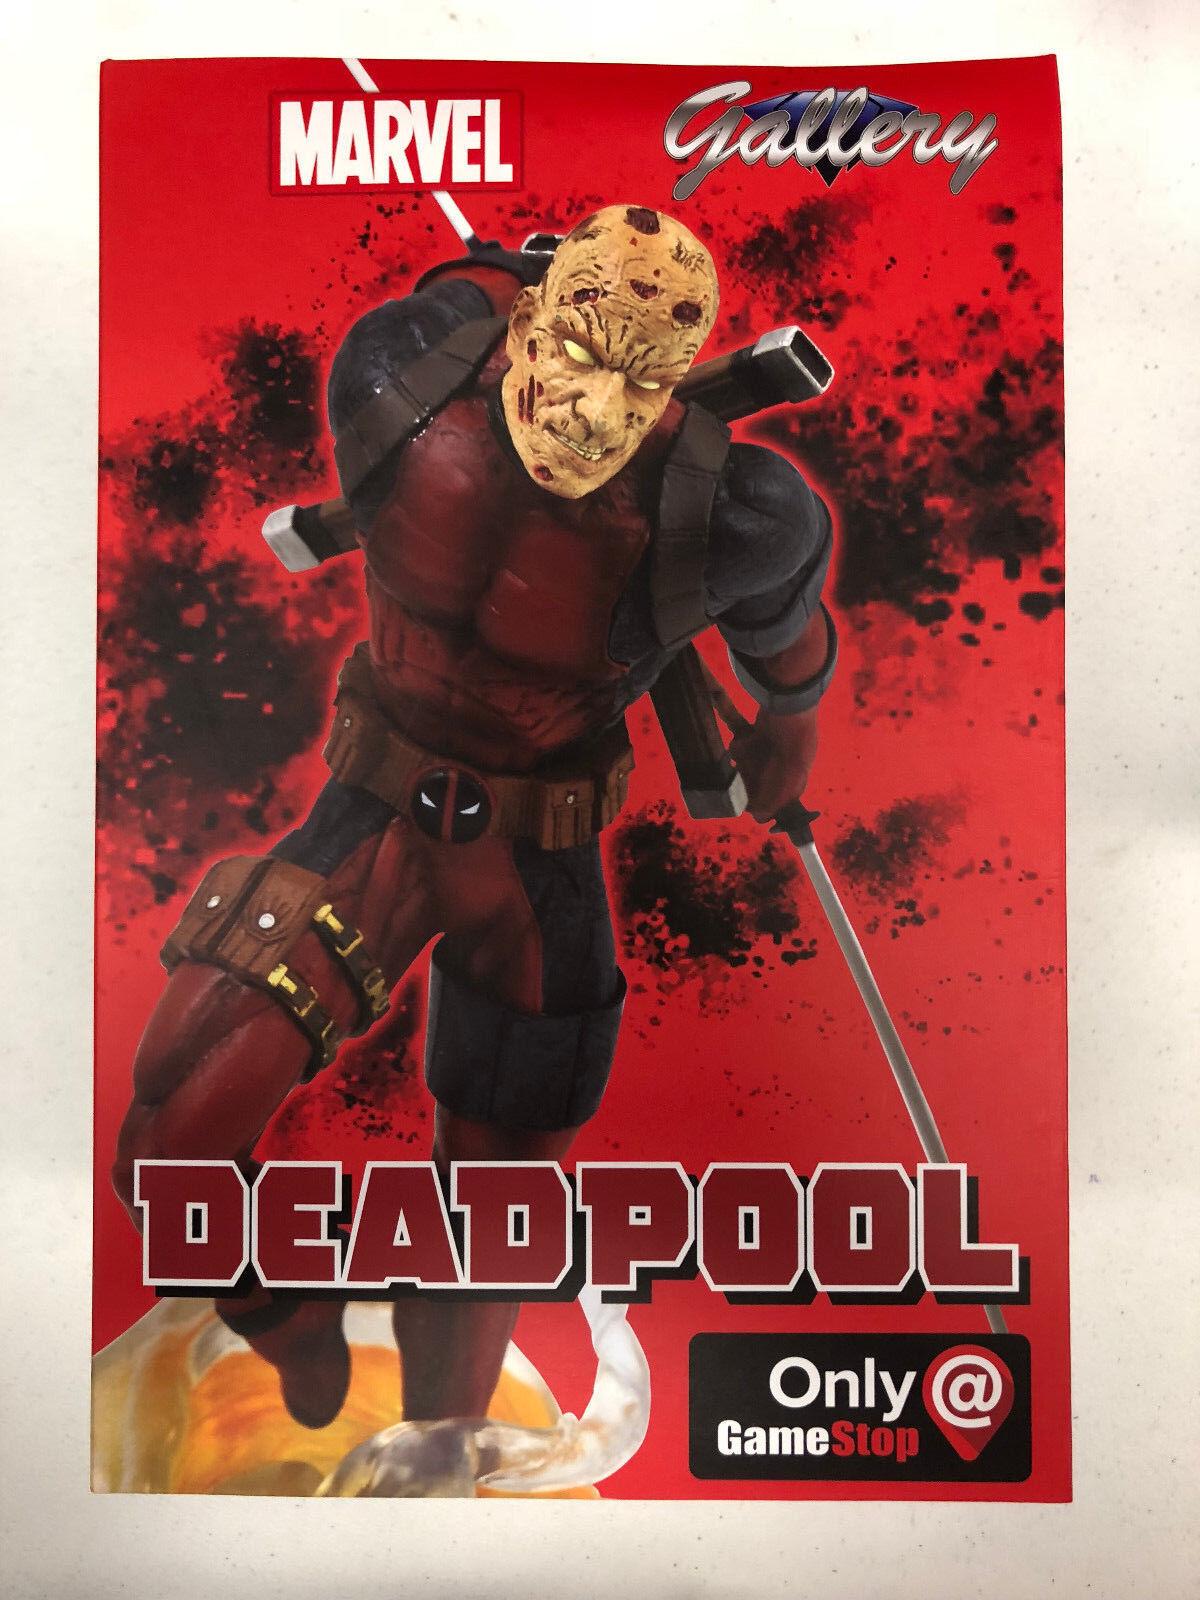 Marvel Deadpool Entlarvt 22.9cm PVC Figur Gamestop Exklusiv Diamant Gallerie